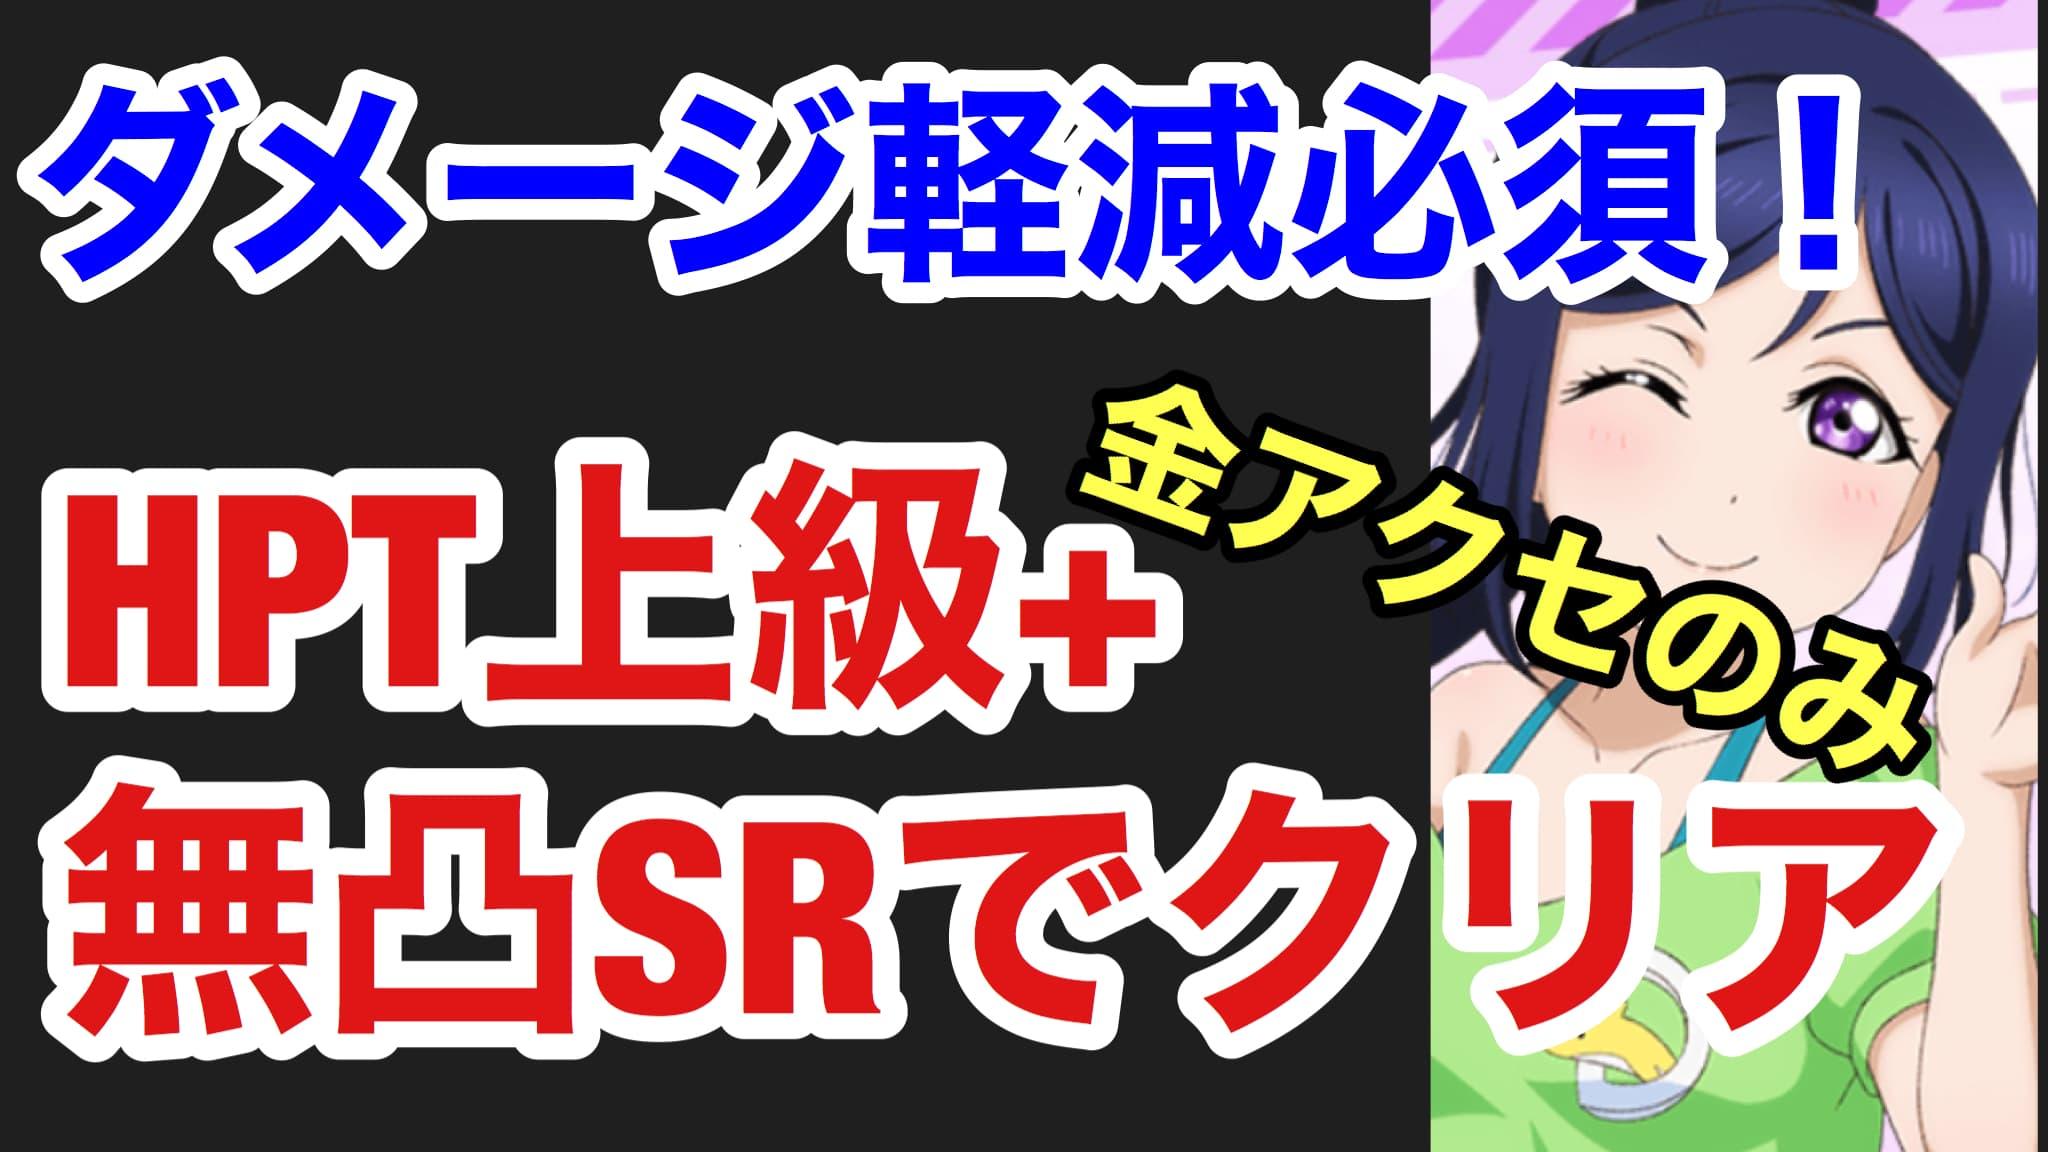 HAPPY PARTY TRAIN上級+攻略